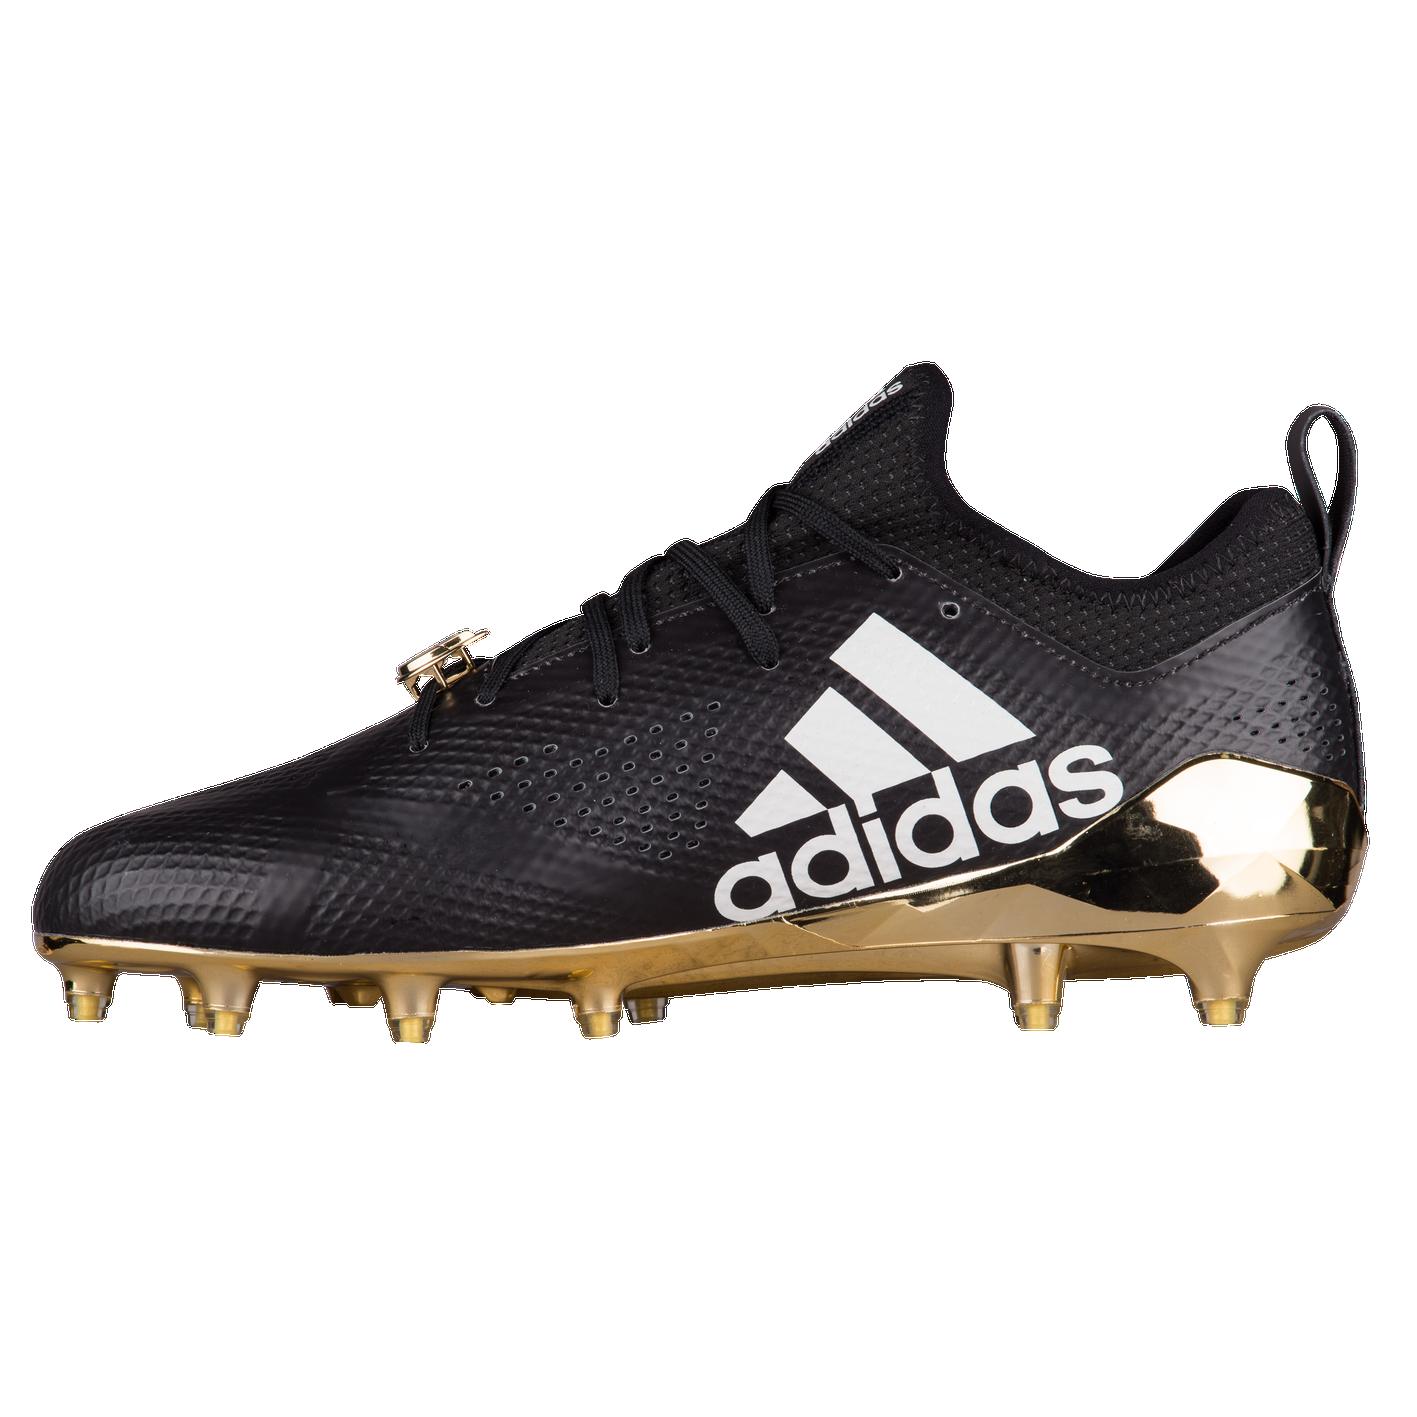 72b3e4711277dd adidas adiZero 5-Star 7.0 adiMoji - Men s - Football - Shoes - Black ...